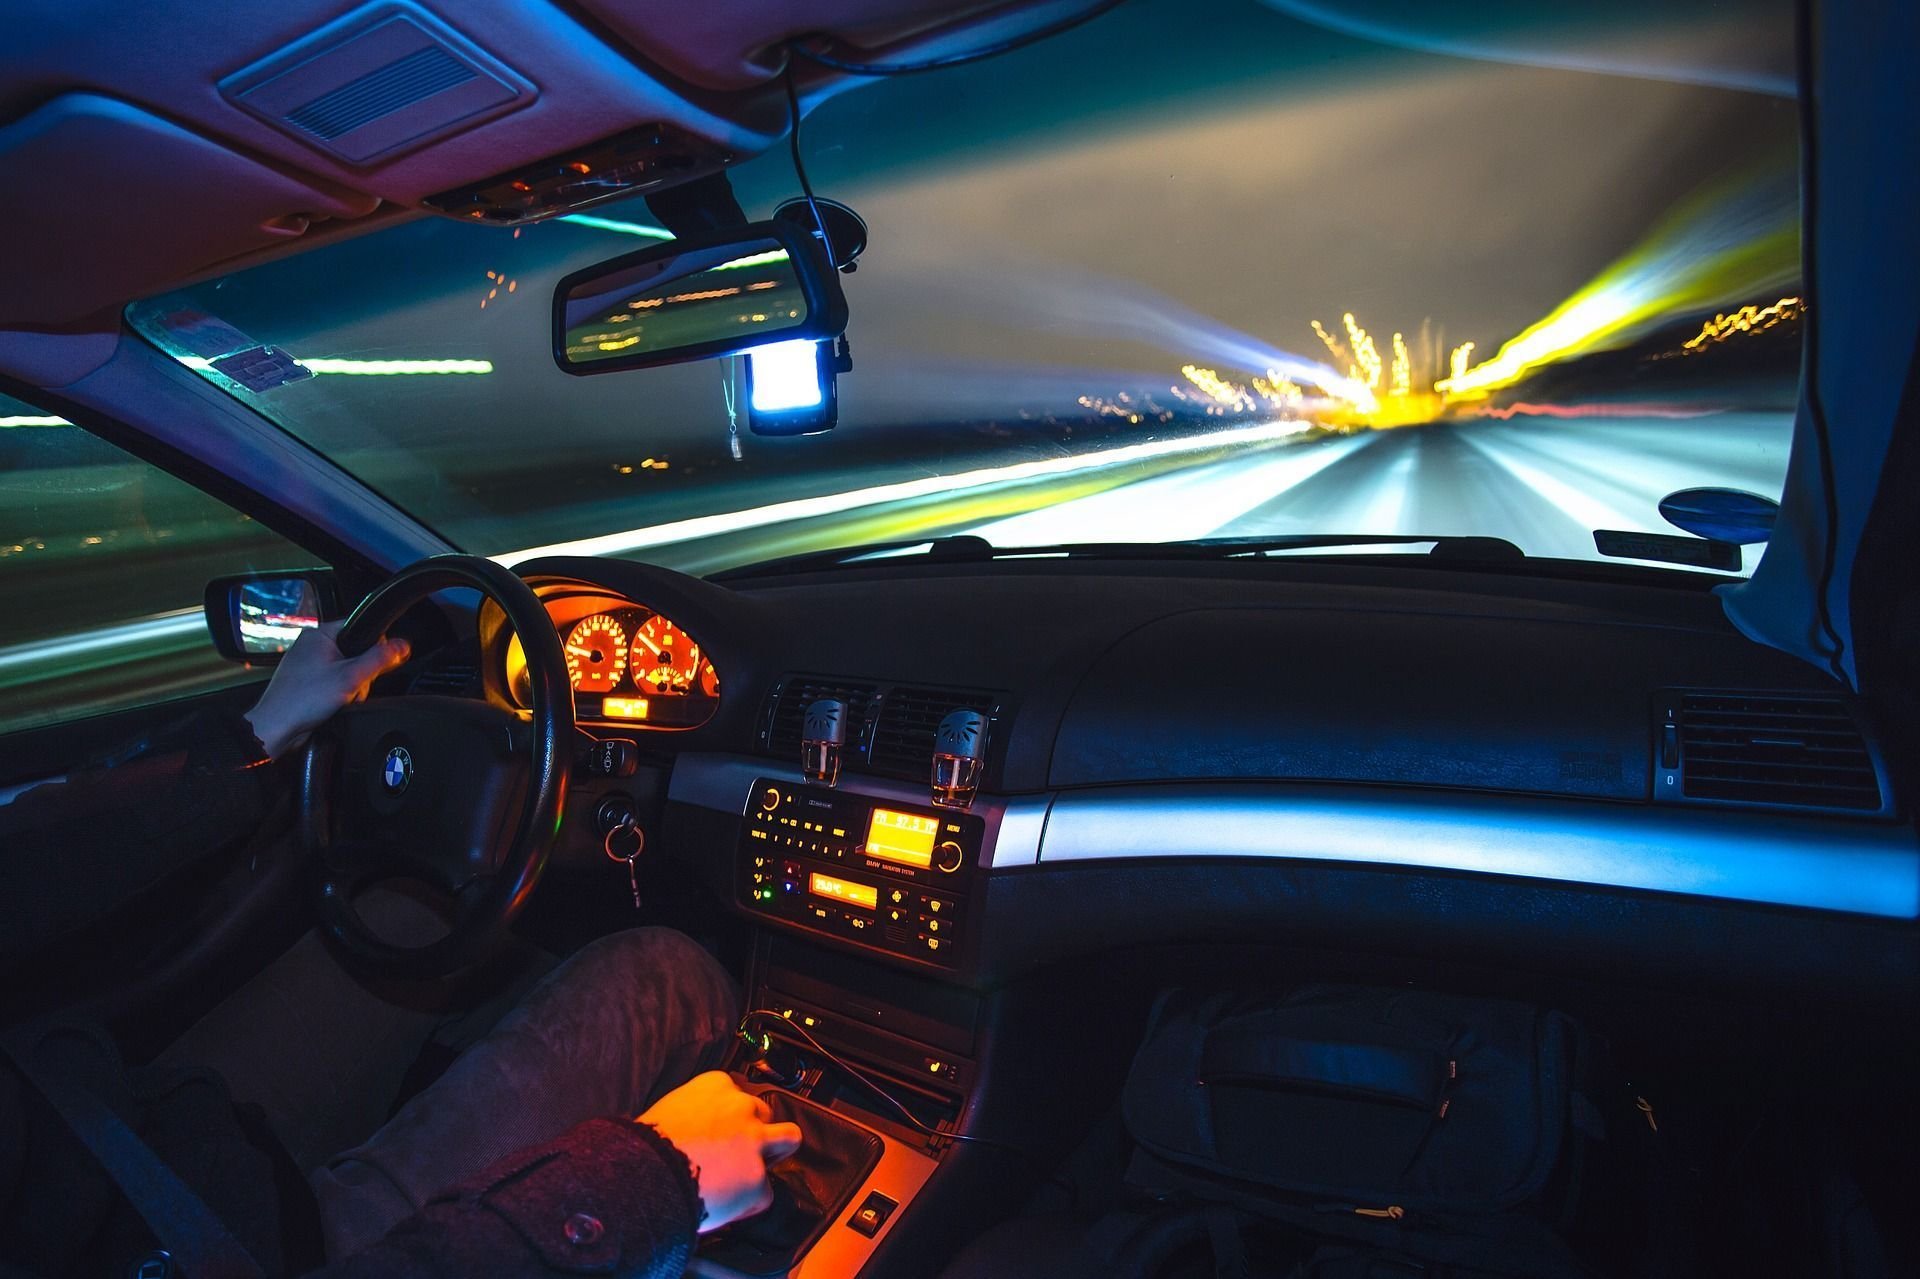 Lentes para conducción nocturna